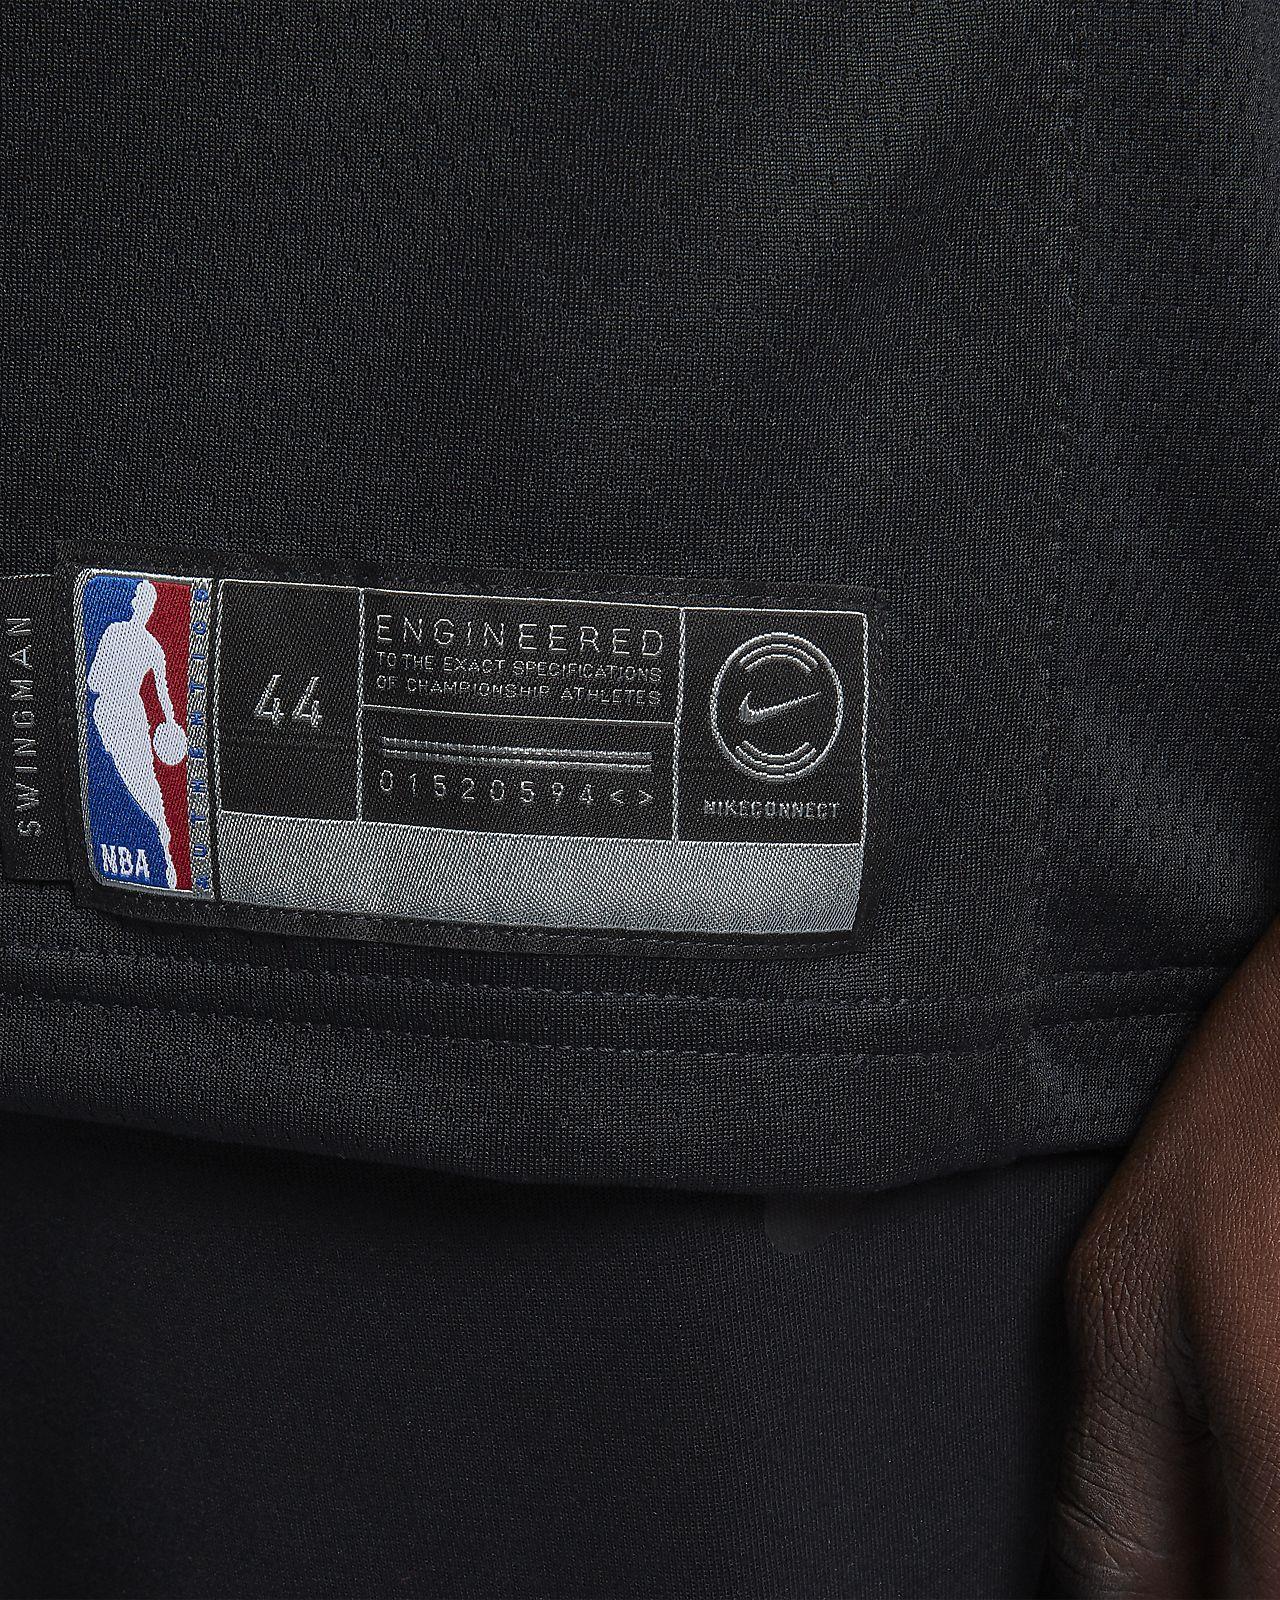 a606ccbd8 ... James Harden Statement Edition Swingman (Houston Rockets) Men's Nike NBA  Connected Jersey